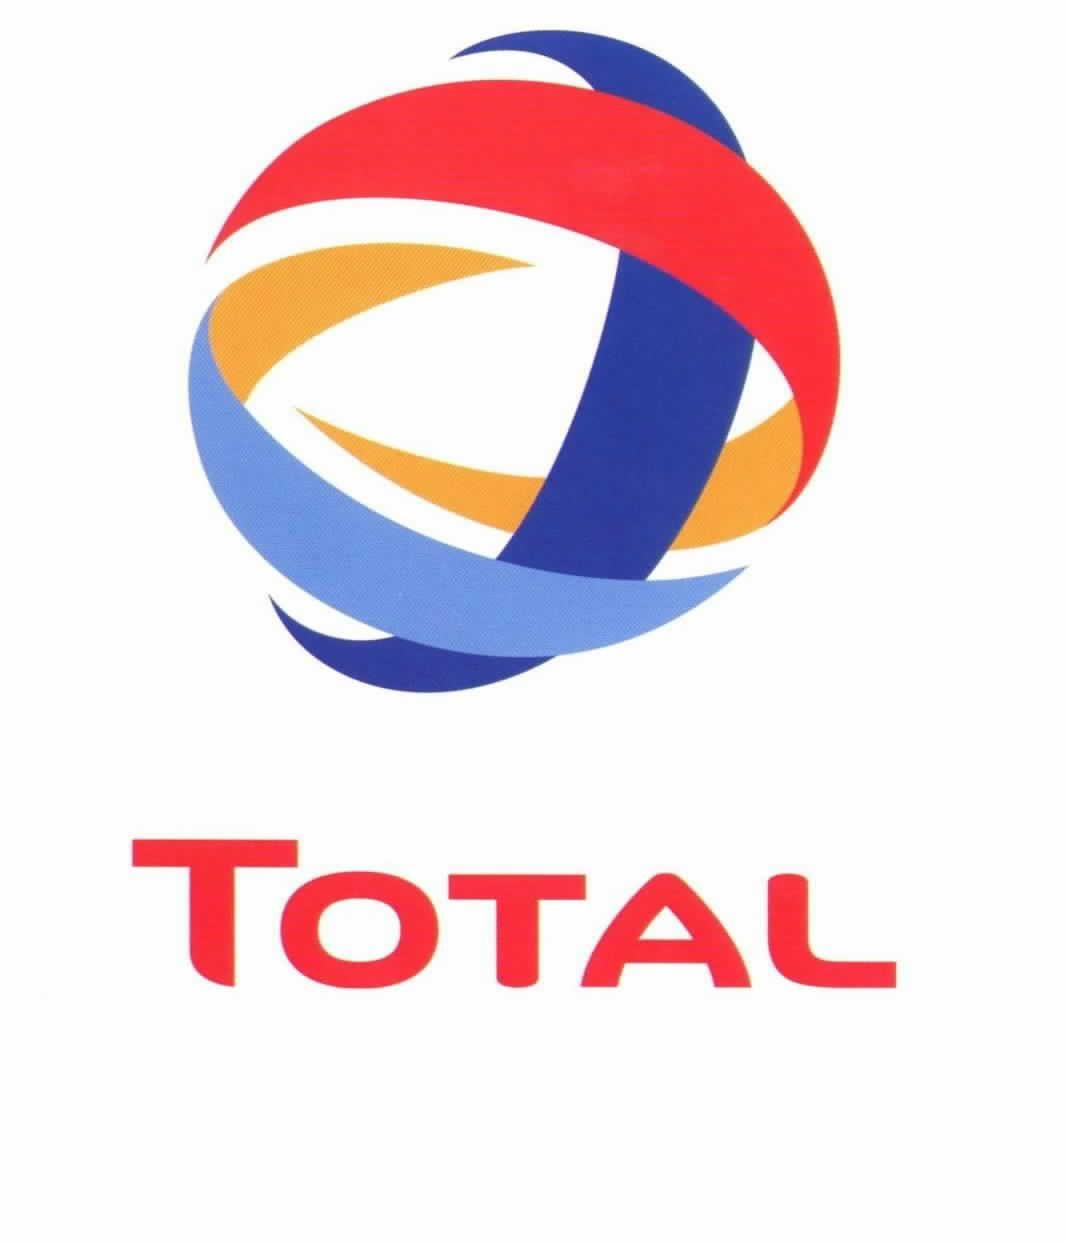 Total (the European oil company) | Logos I Like | Famous ...